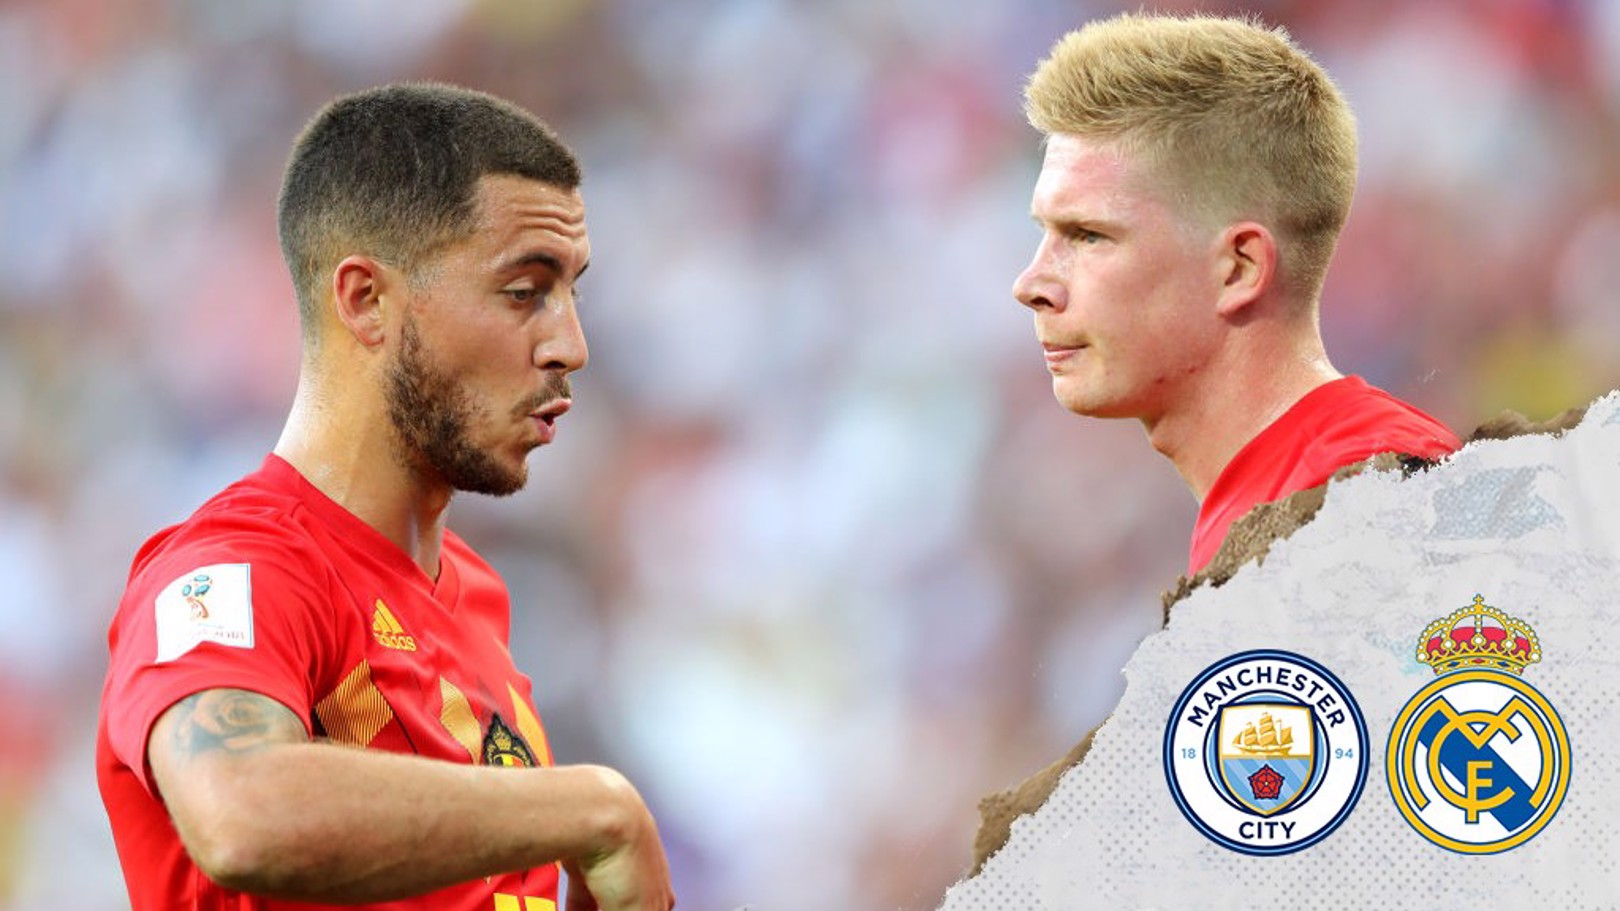 De Bruyne vs Hazard: La Bataille des Belges